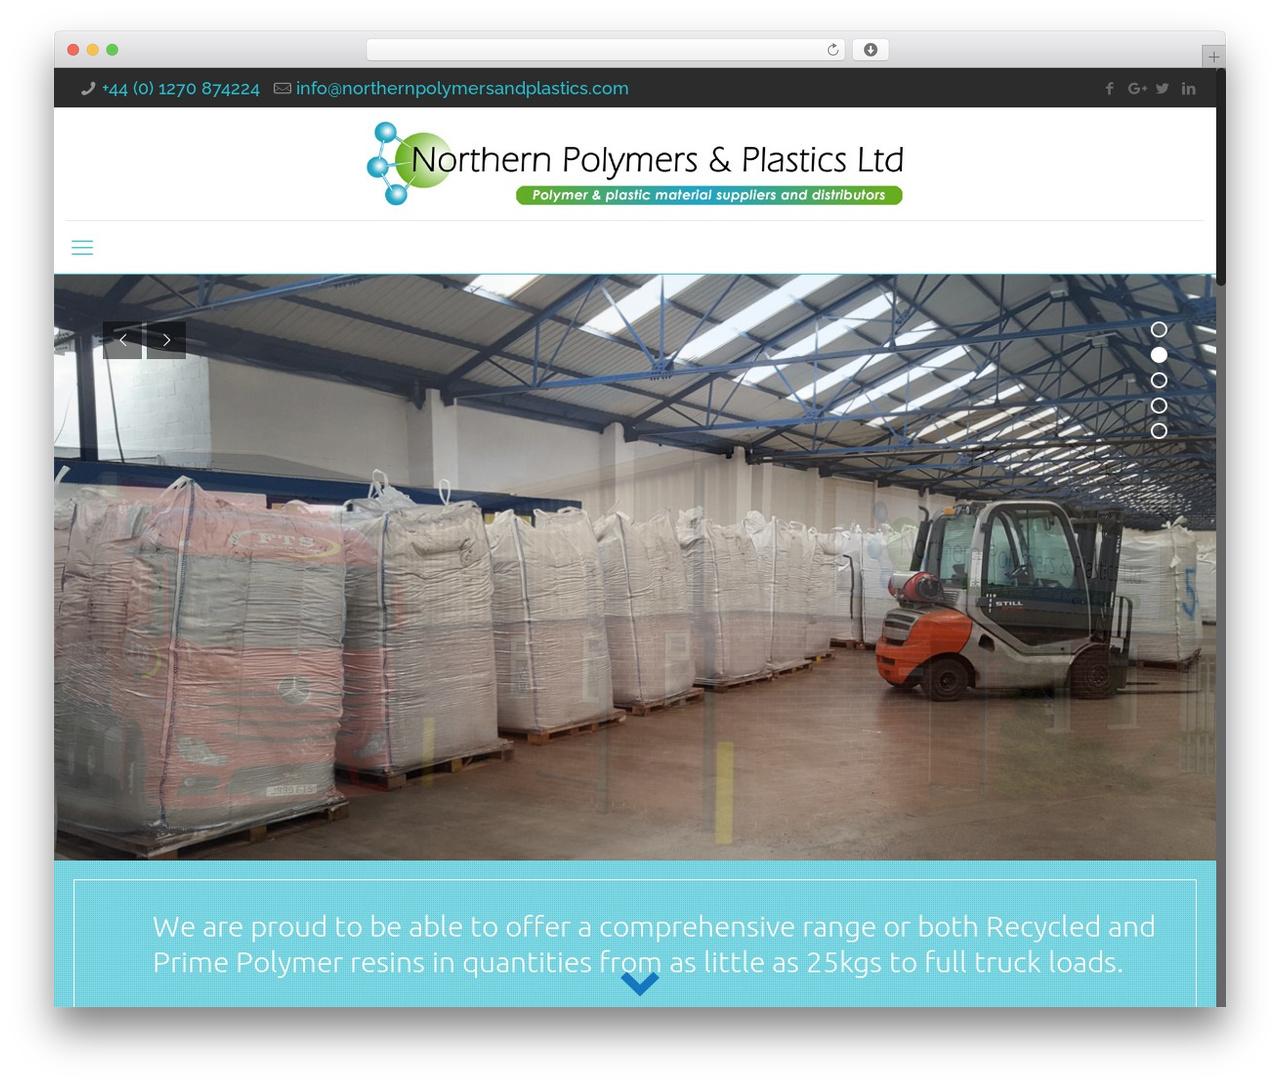 Northern Polymers and Plastics Ltd. WordPress template - northernpolymersandplastics.com